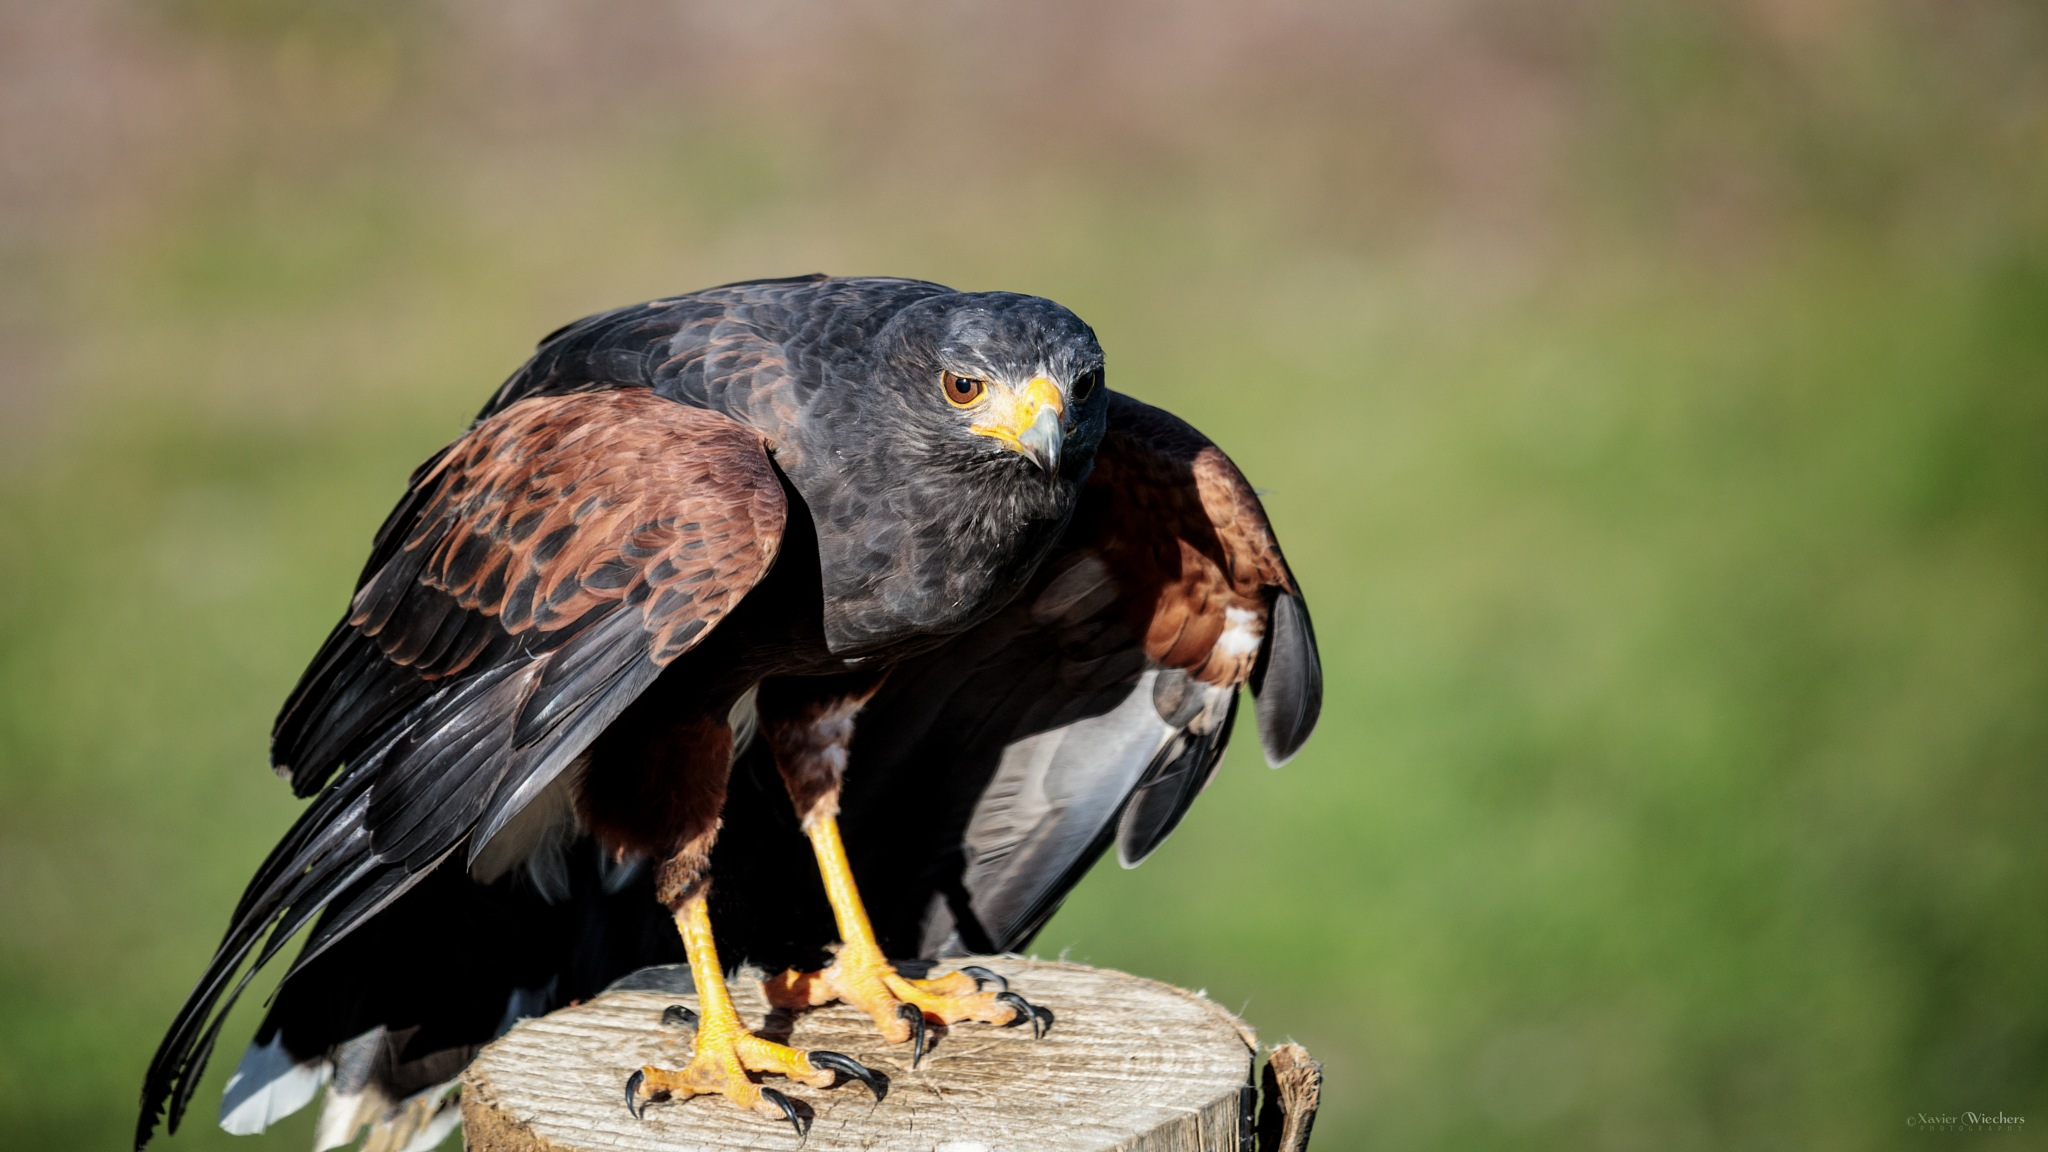 Grouse Mountain Hawk I by xwiechers